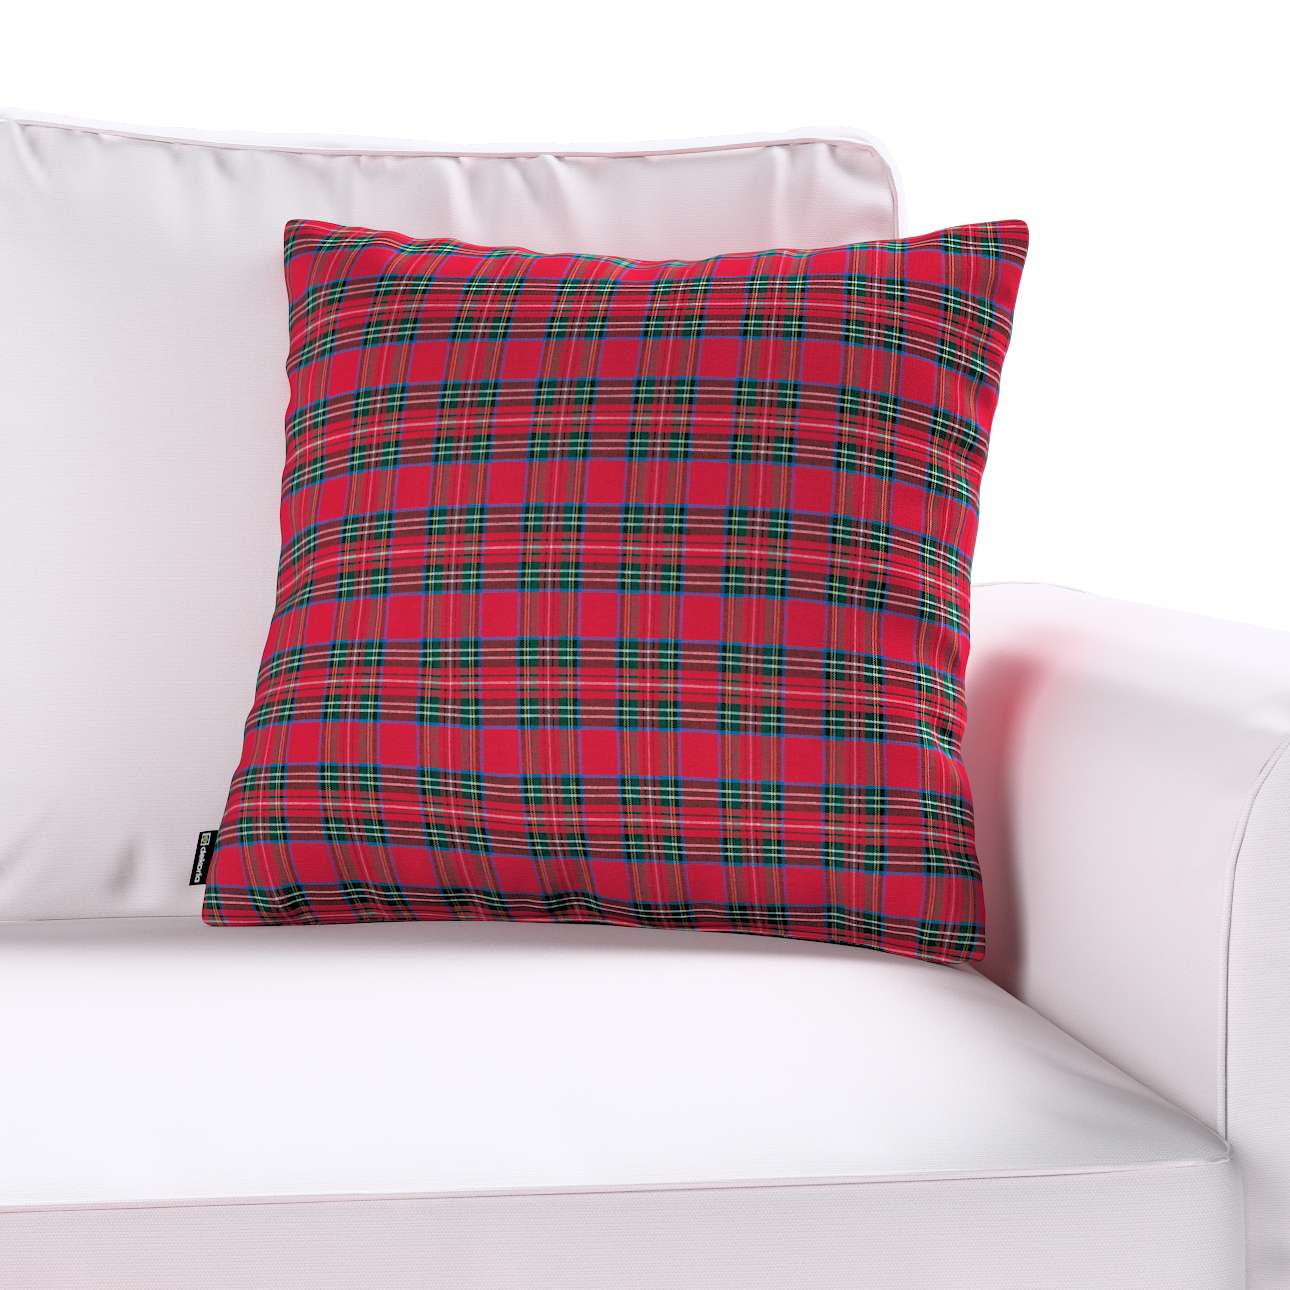 Poszewka Kinga na poduszkę w kolekcji Bristol, tkanina: 126-29